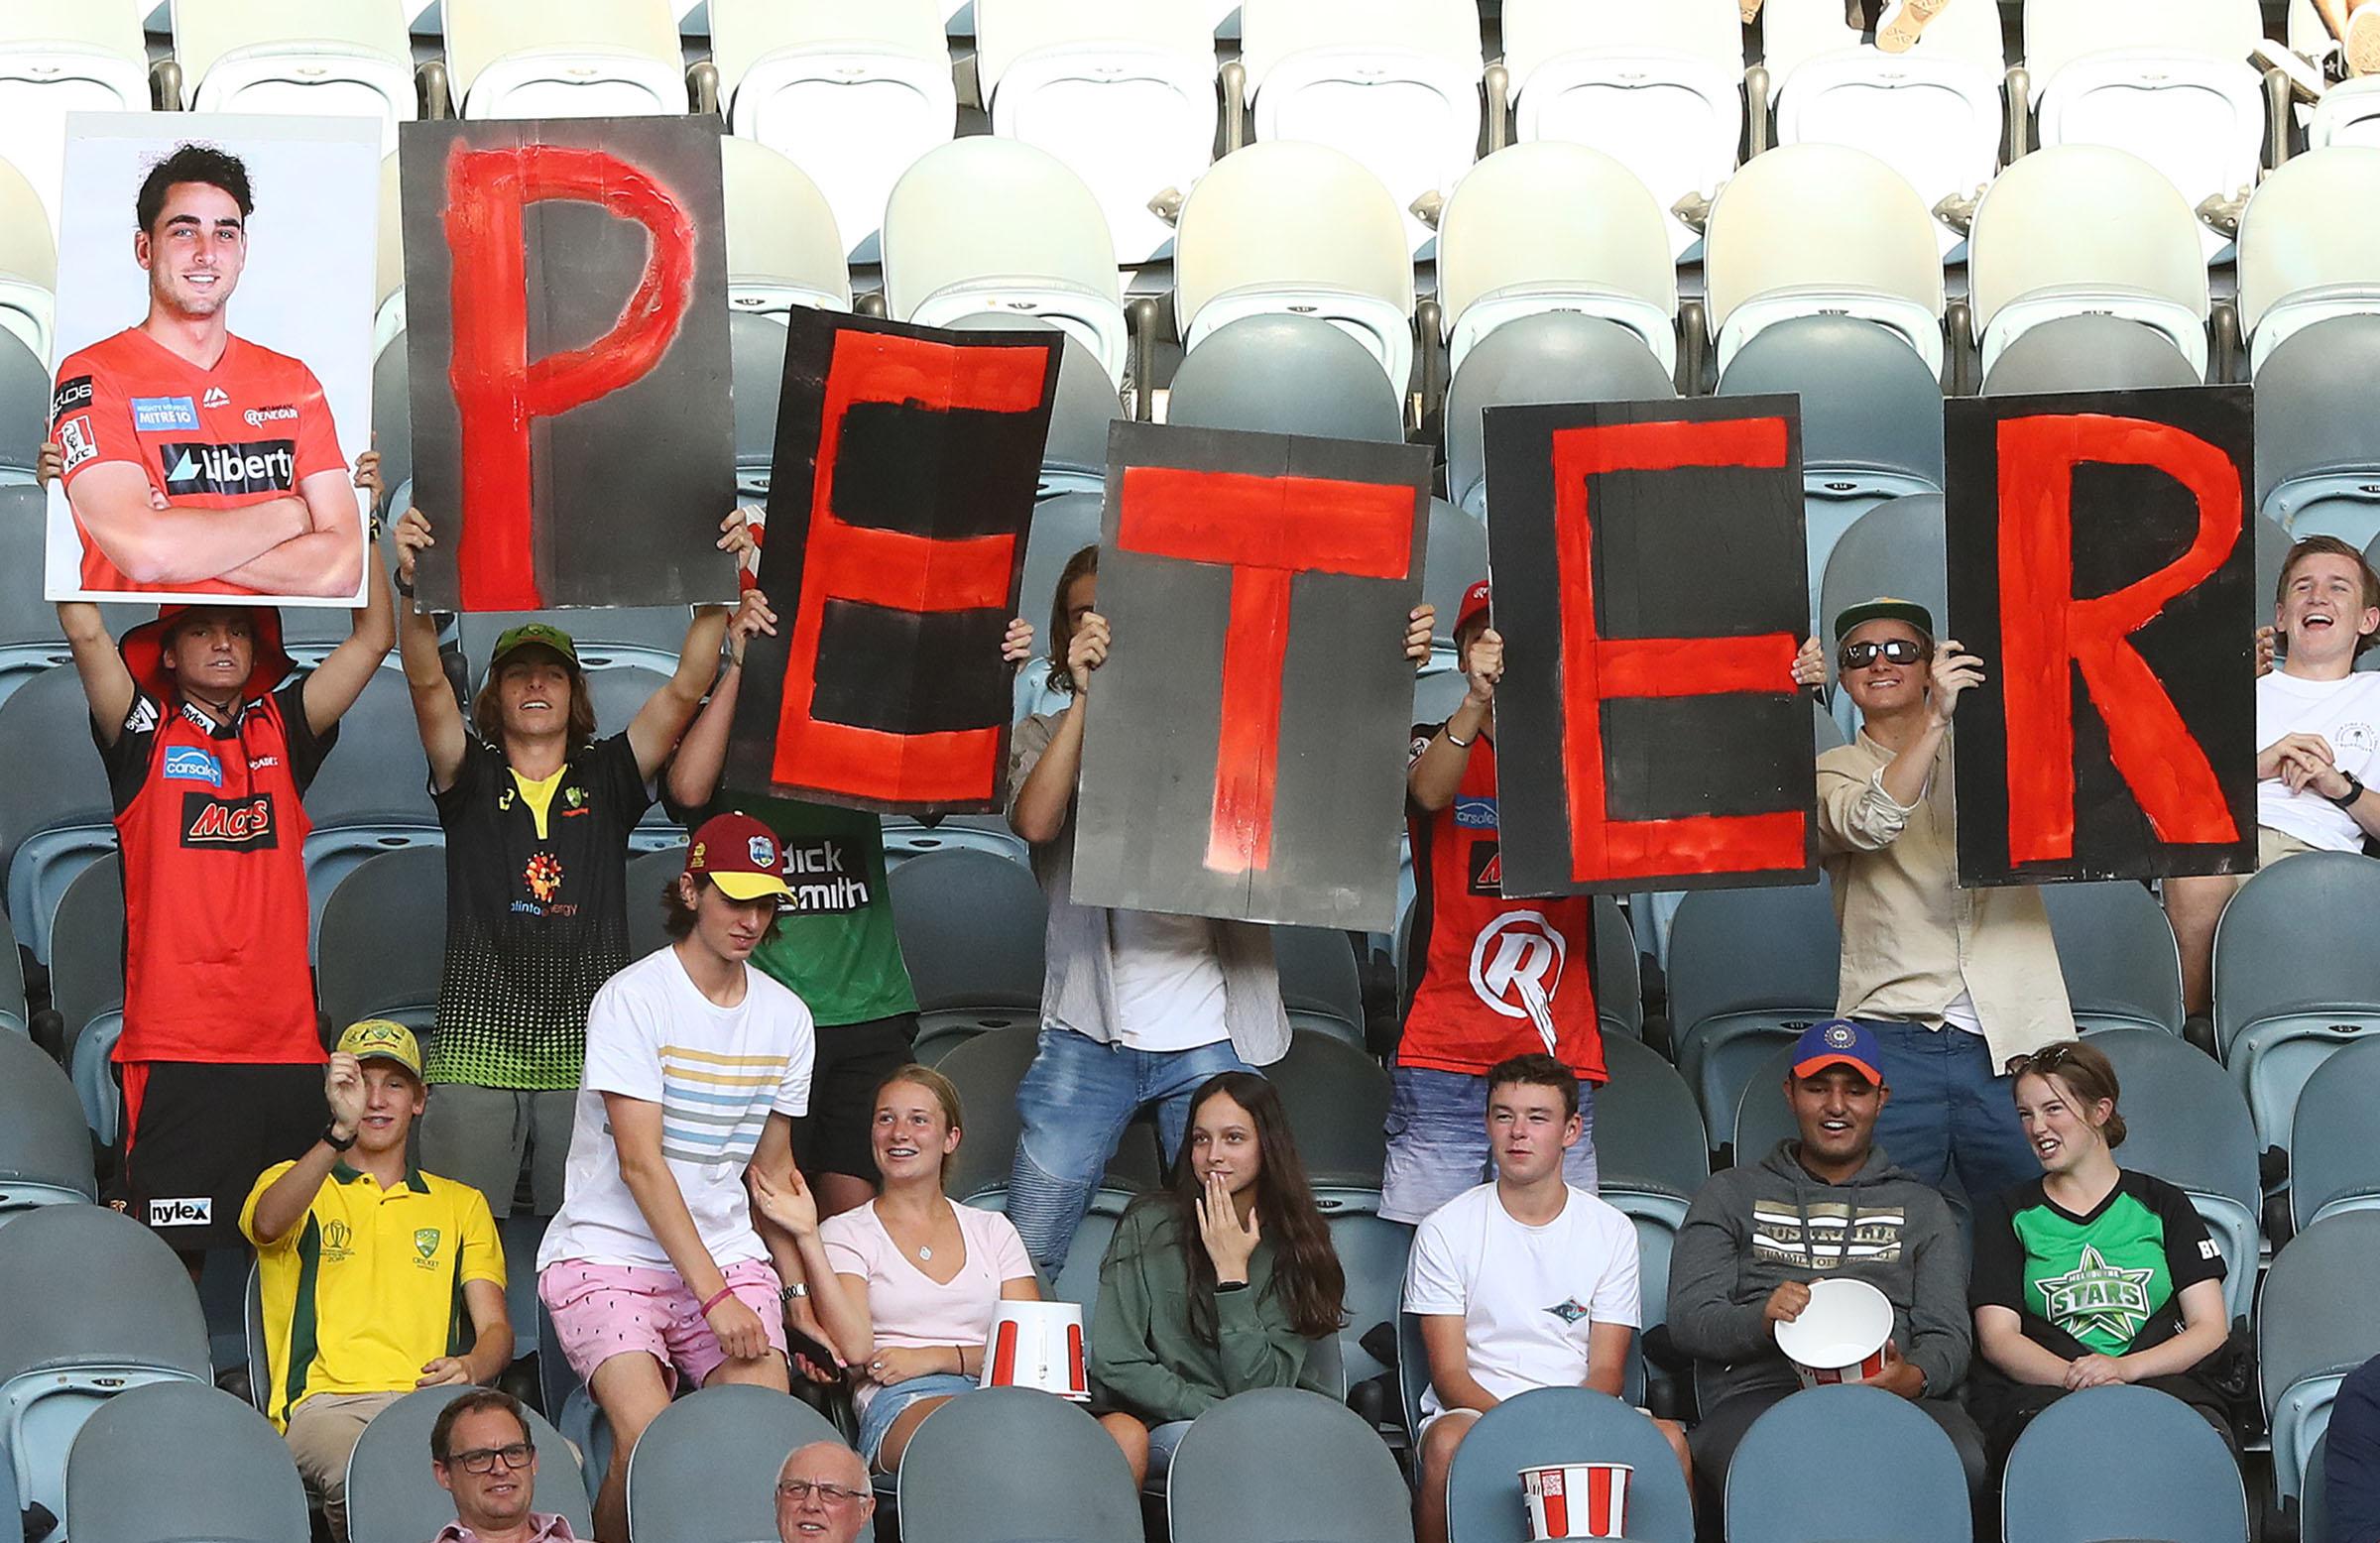 'Peter' built a cult following among Renegades fans // Getty